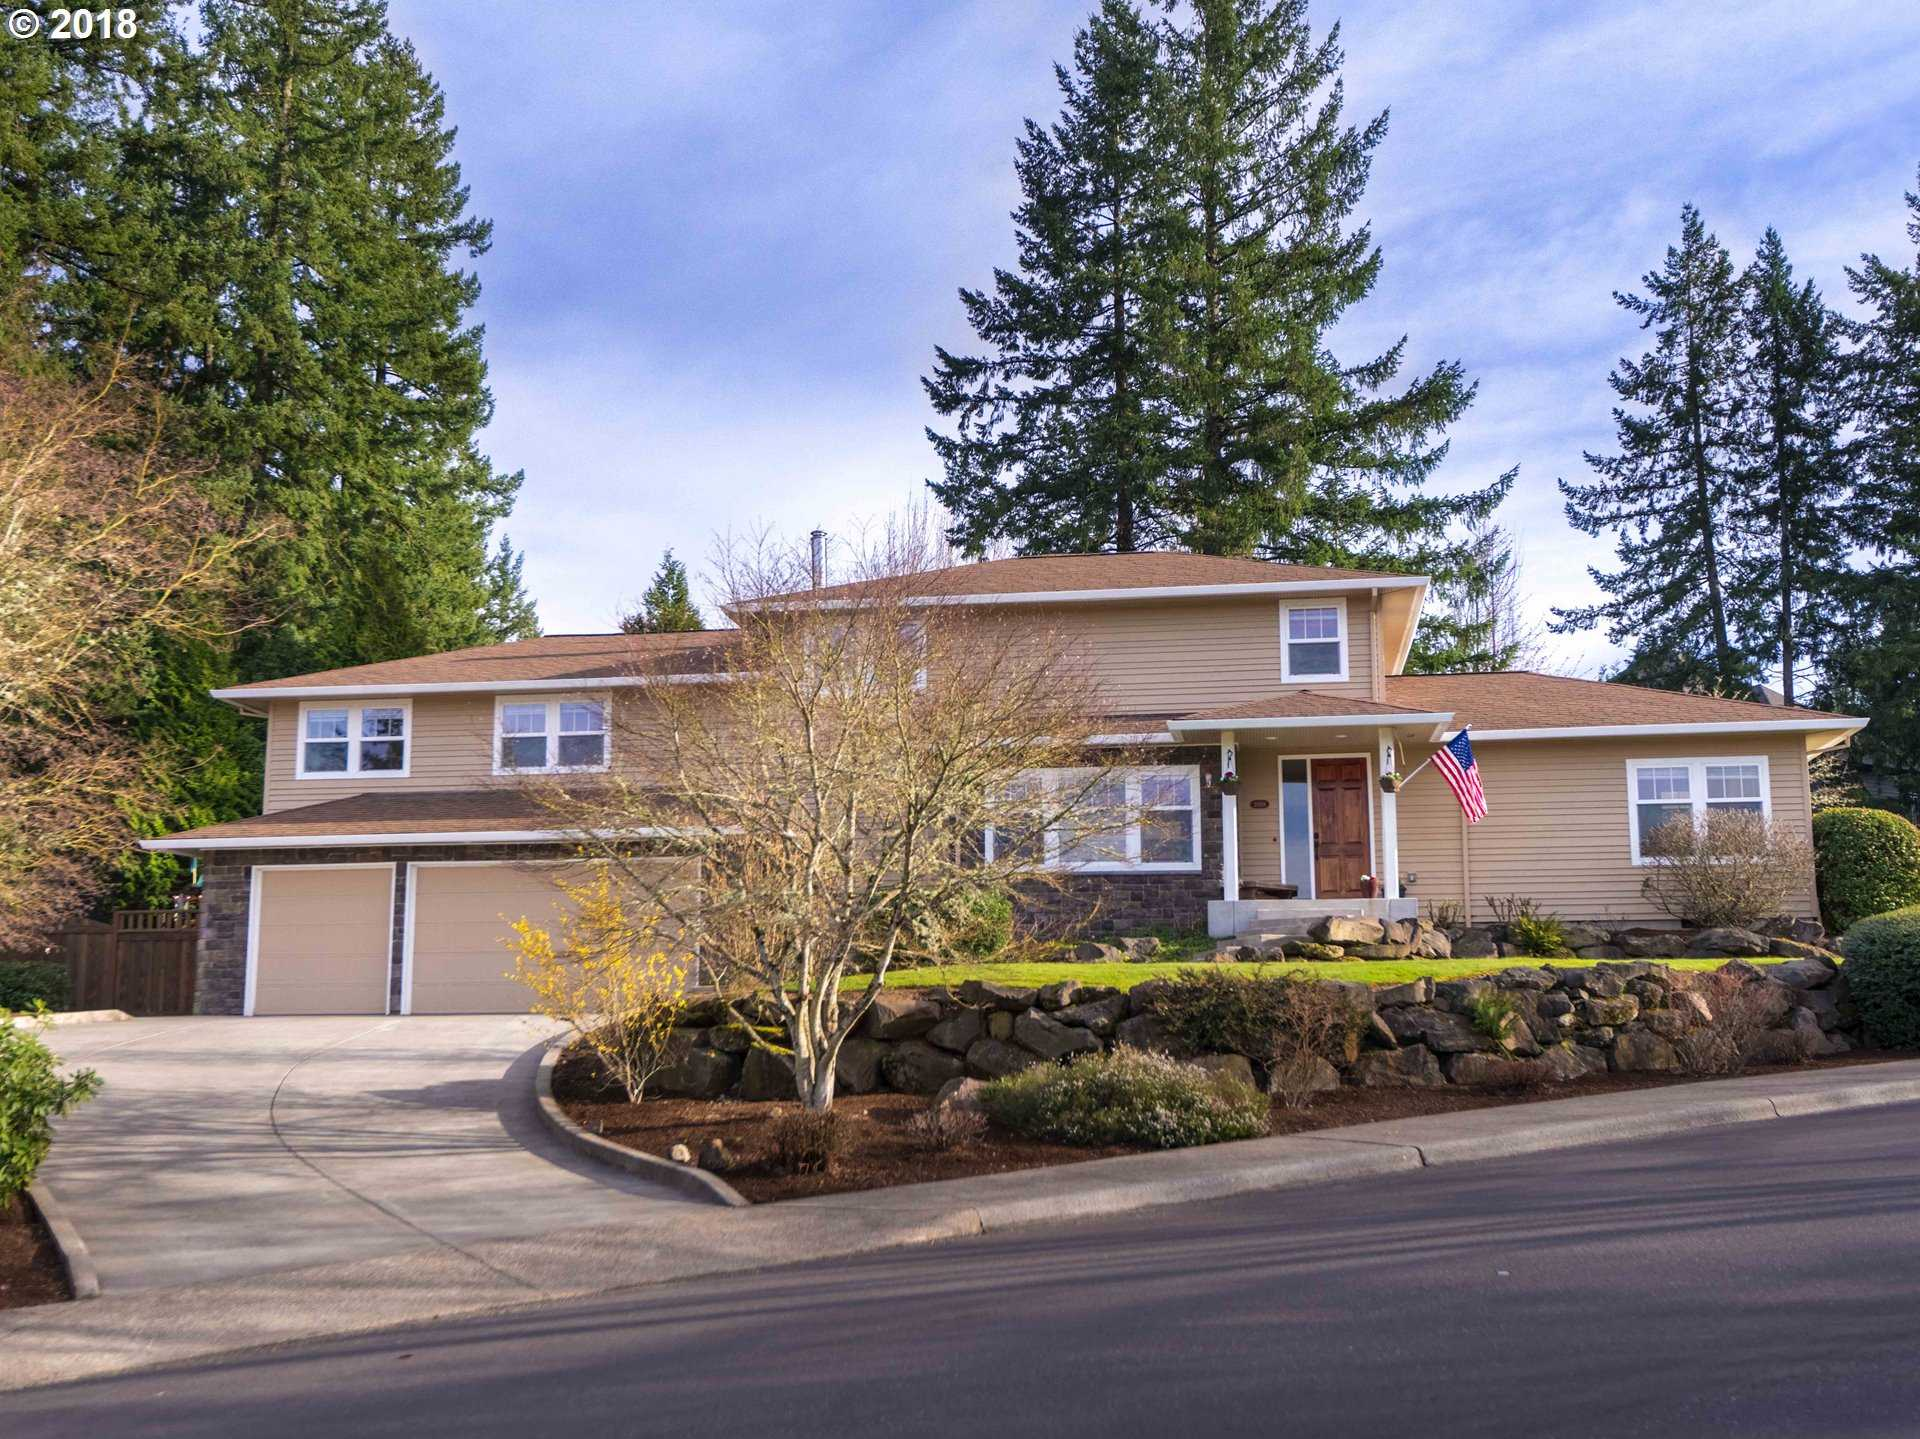 $725,000 - 5Br/4Ba -  for Sale in Cooper Mountain, Beaverton